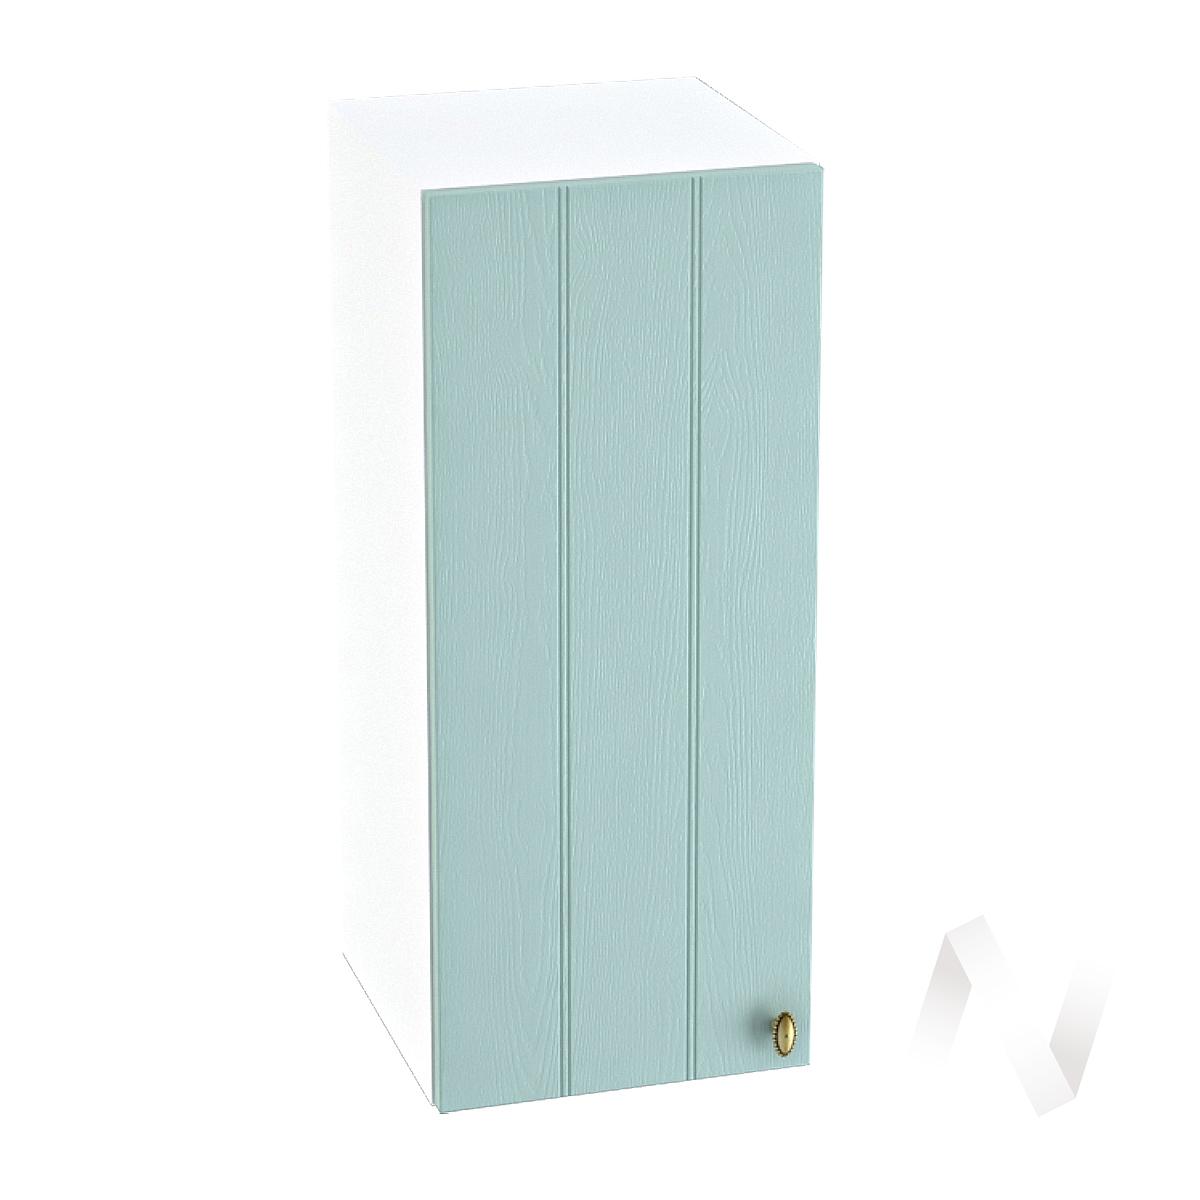 "Кухня ""Прованс"": Шкаф верхний 300, ШВ 300 (голубой/корпус белый)"